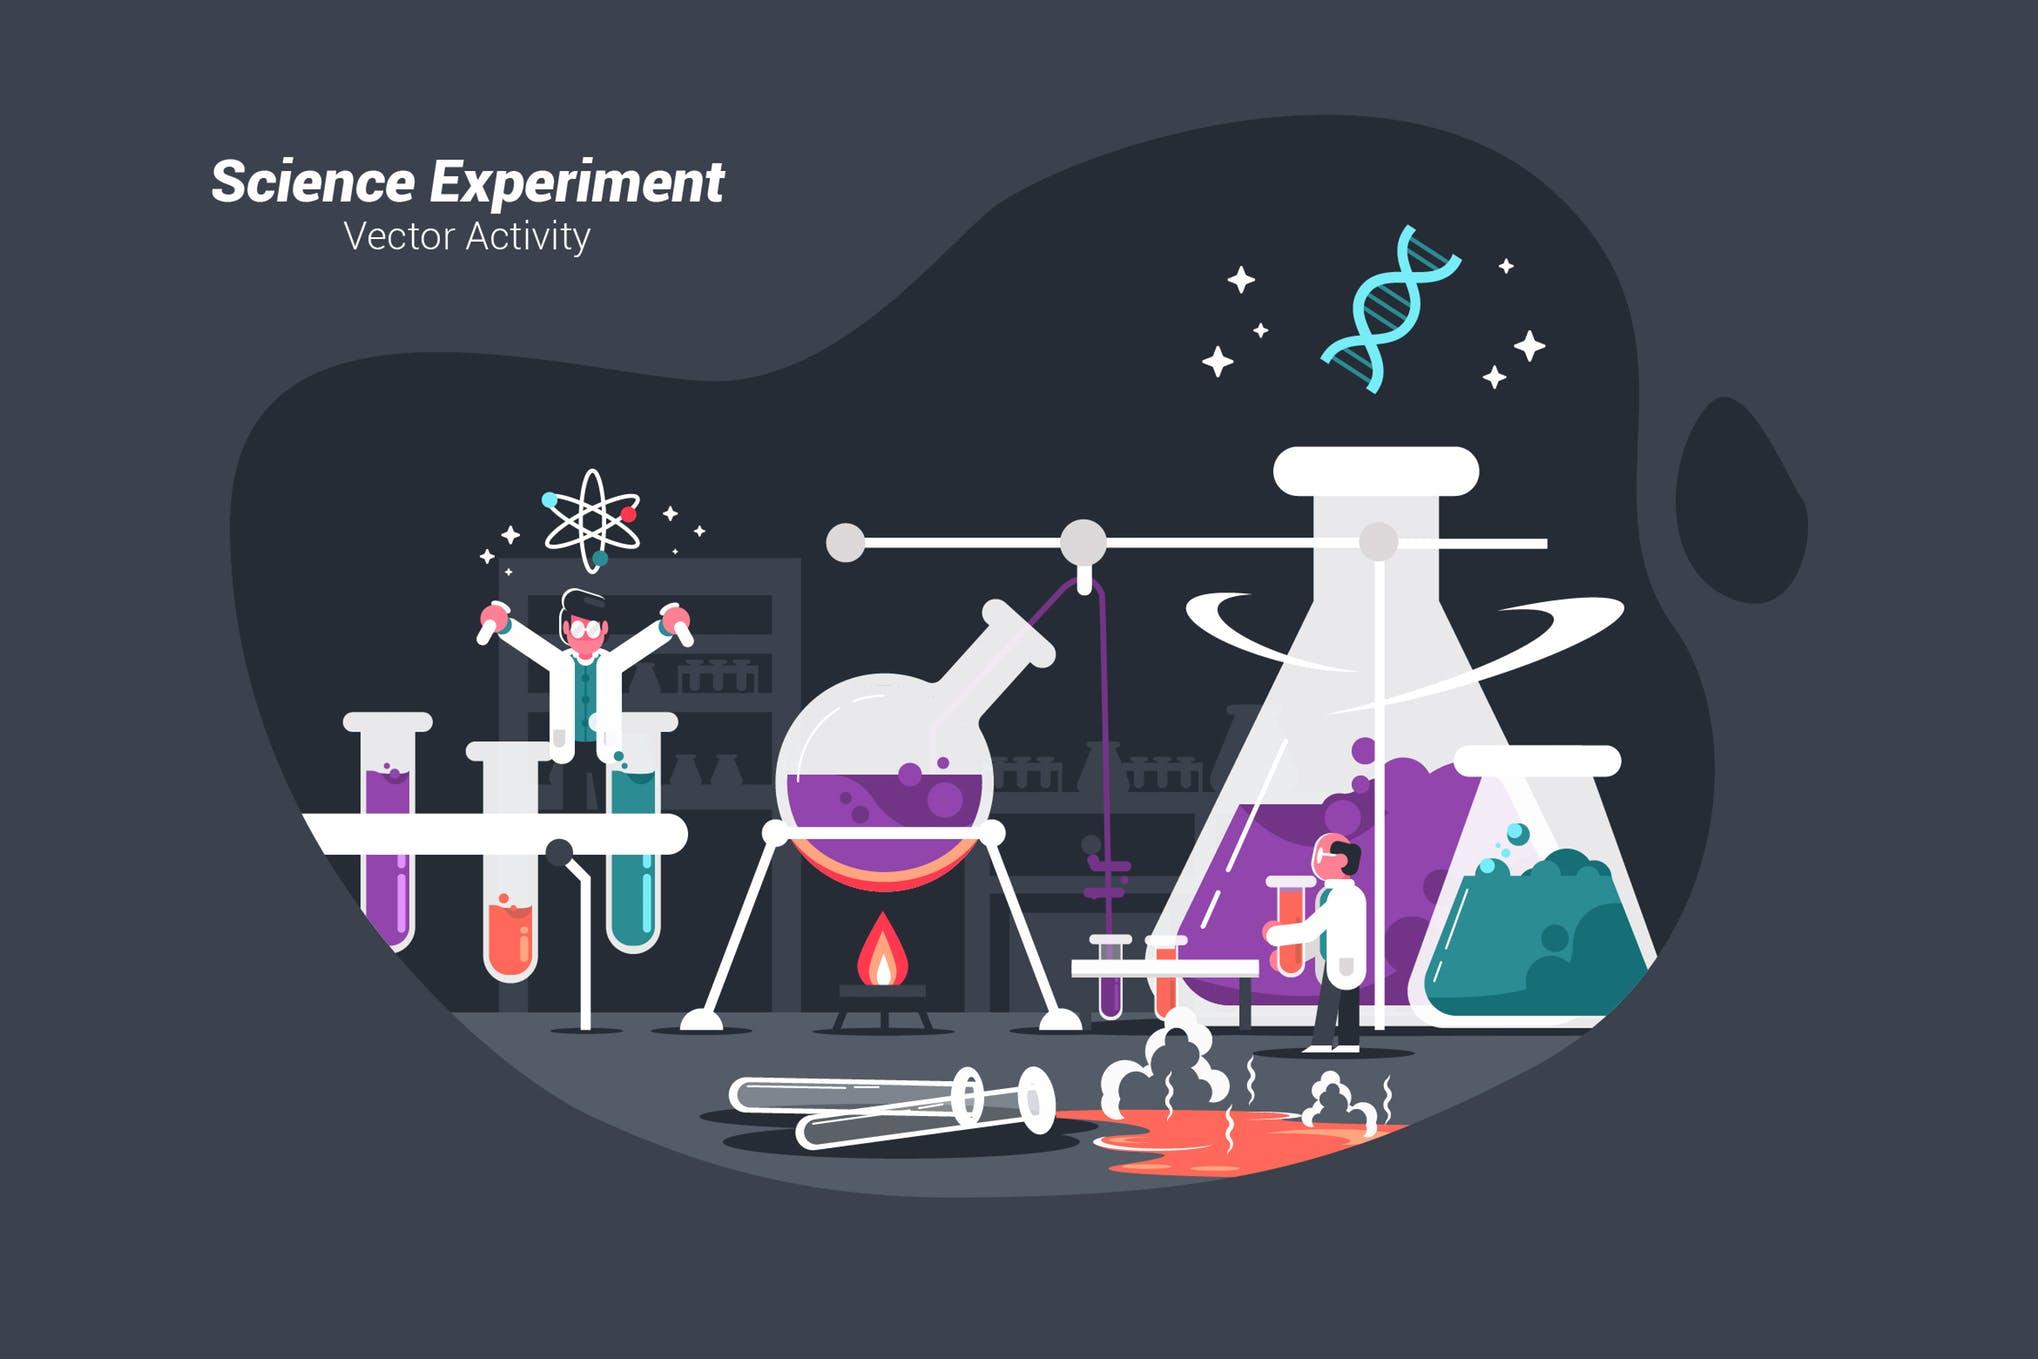 科学时限创意矢量插画素材下载Science Experiment - Vector Illustration